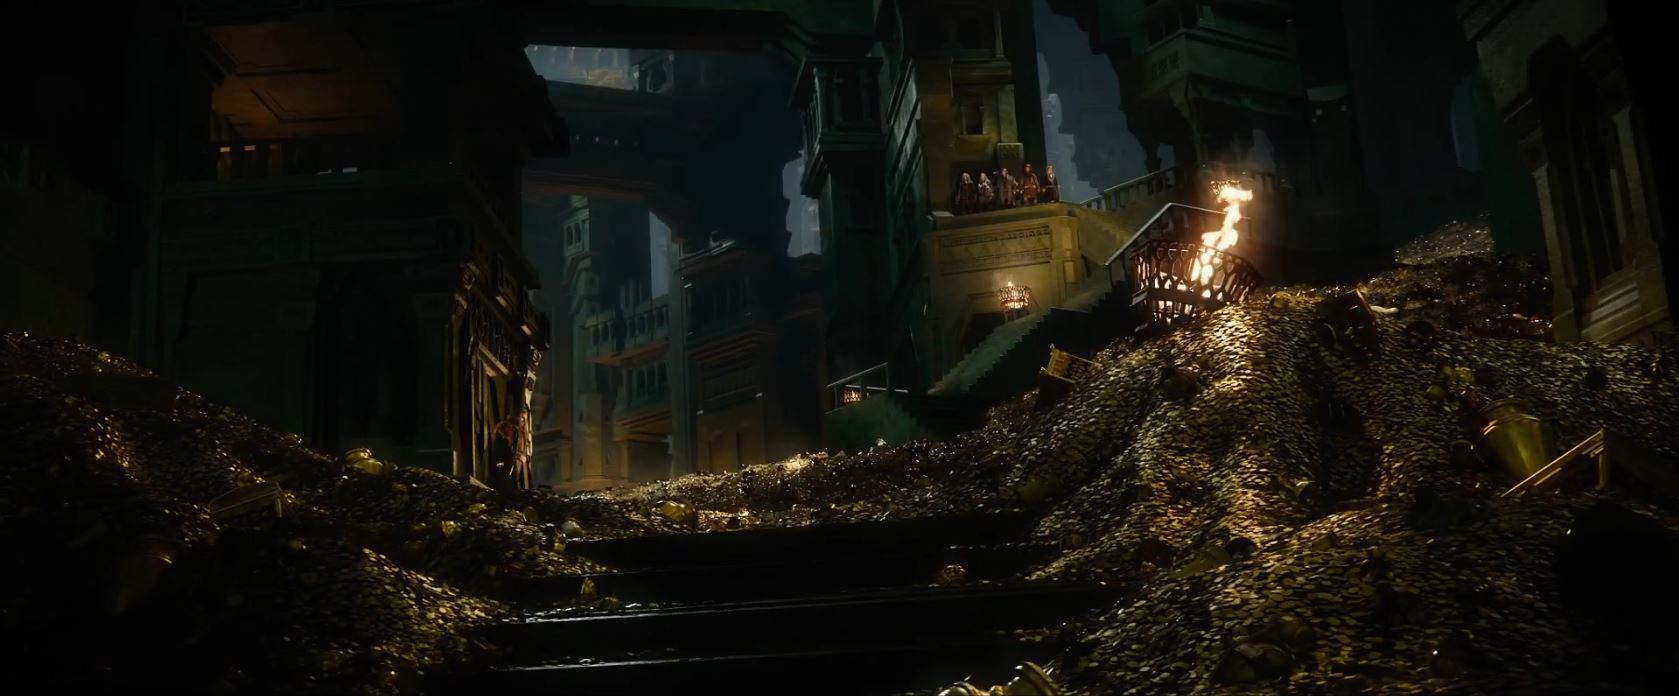 The Hobbit The Battle of the Five Armies Trailer - Erebor riches